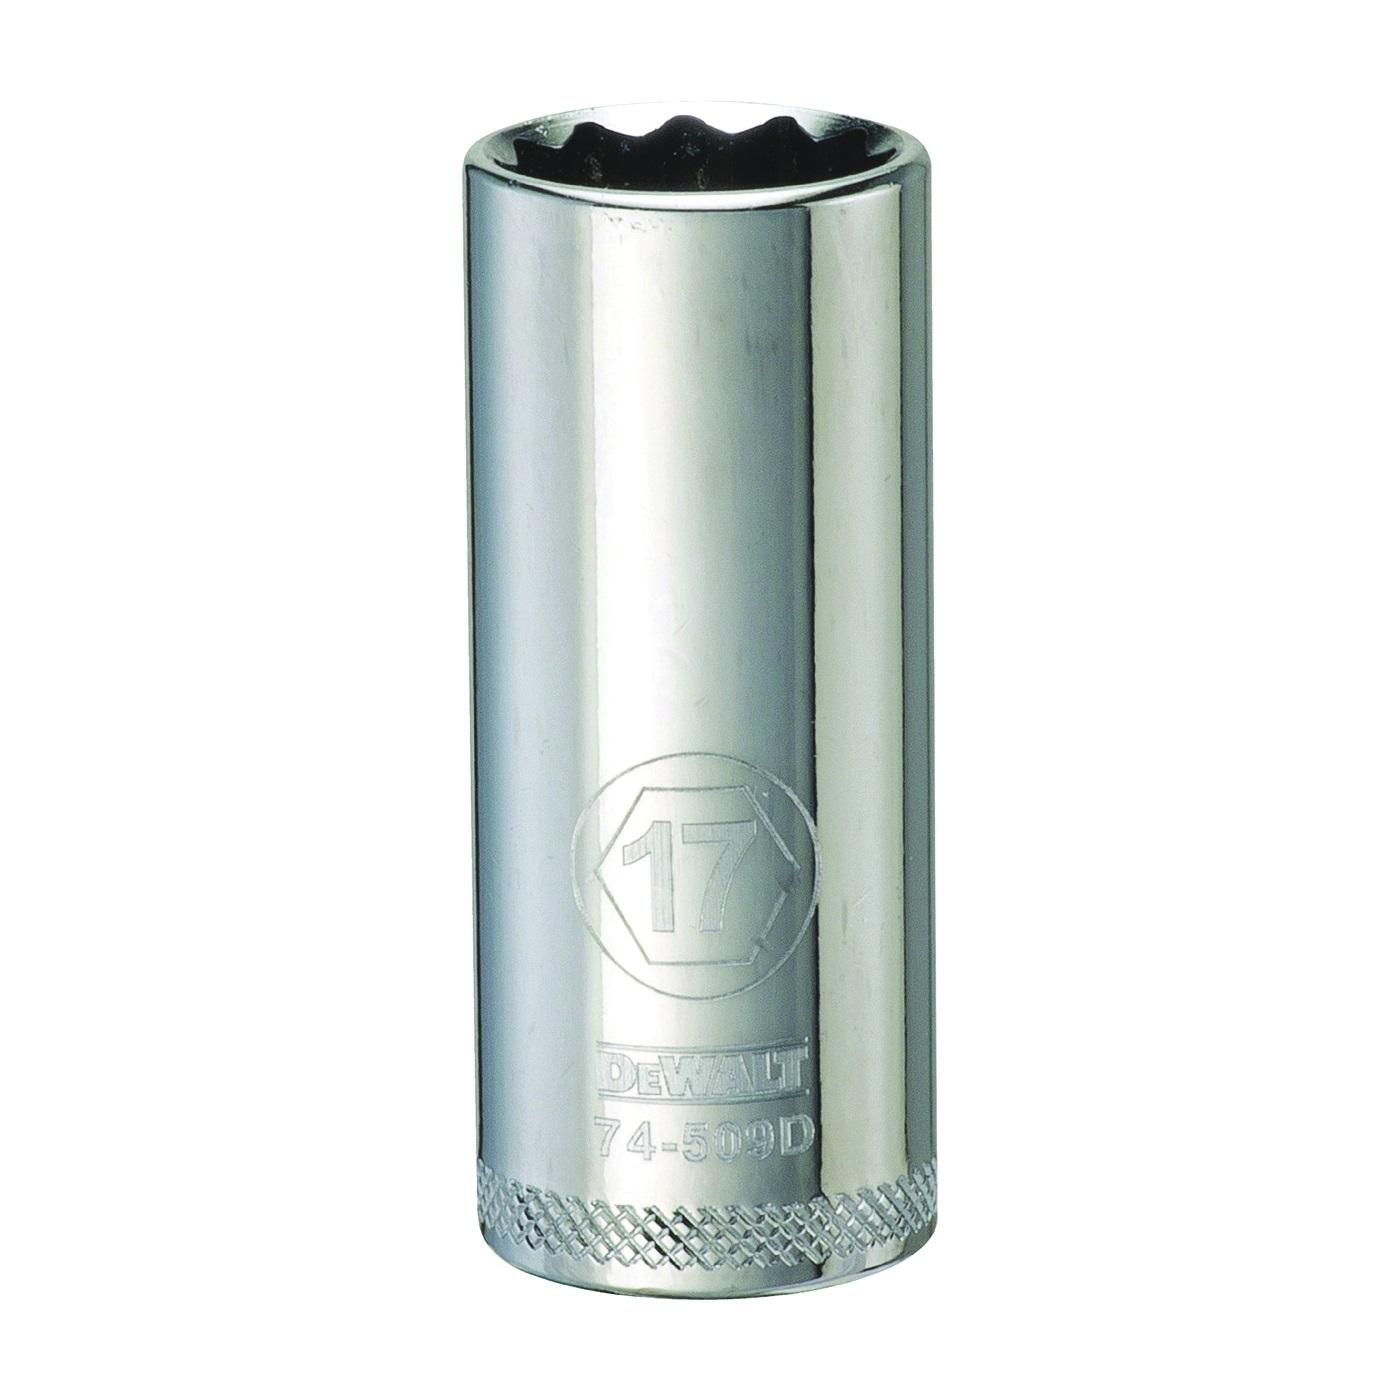 Picture of DeWALT DWMT74509OSP Drive Socket, 17 mm Socket, 3/8 in Drive, 12 -Point, Vanadium Steel, Polished Chrome